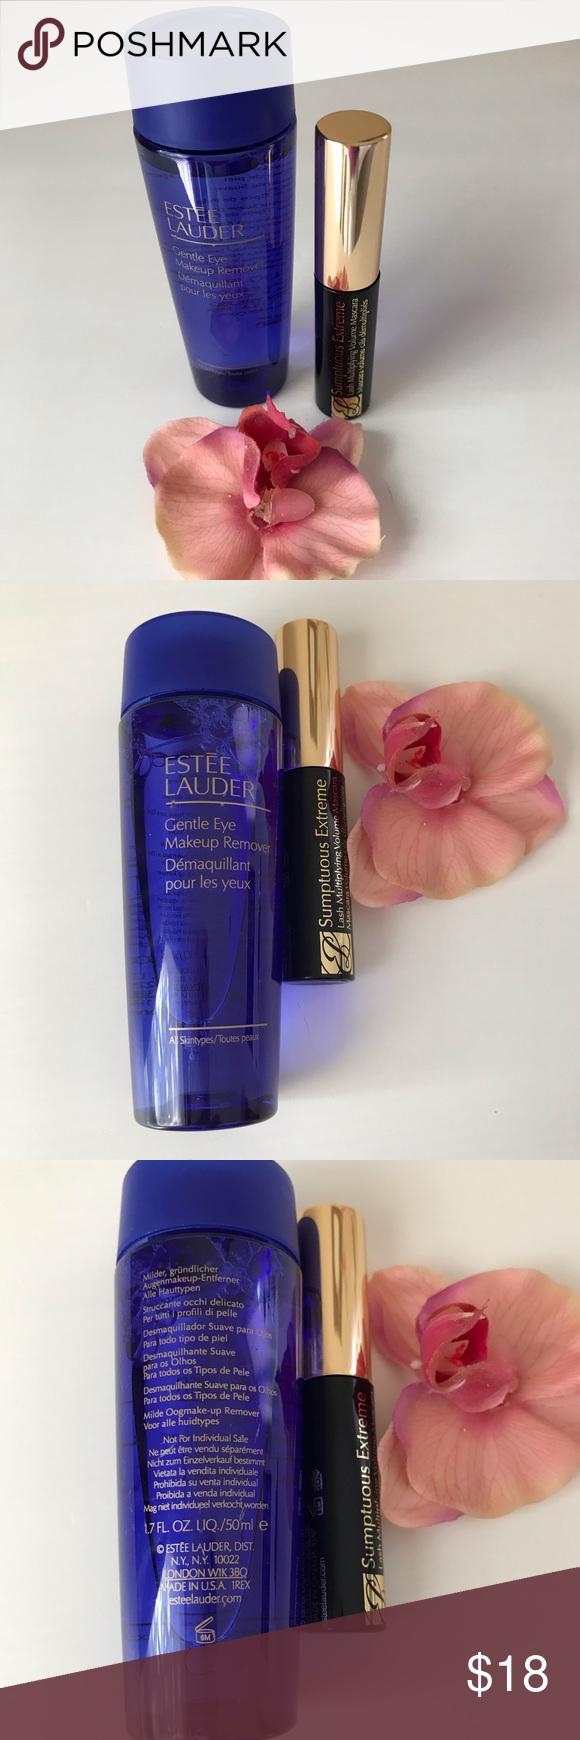 NEW ESTEE LAUDER EYE Makeup Remover & MASCARA NWT (With